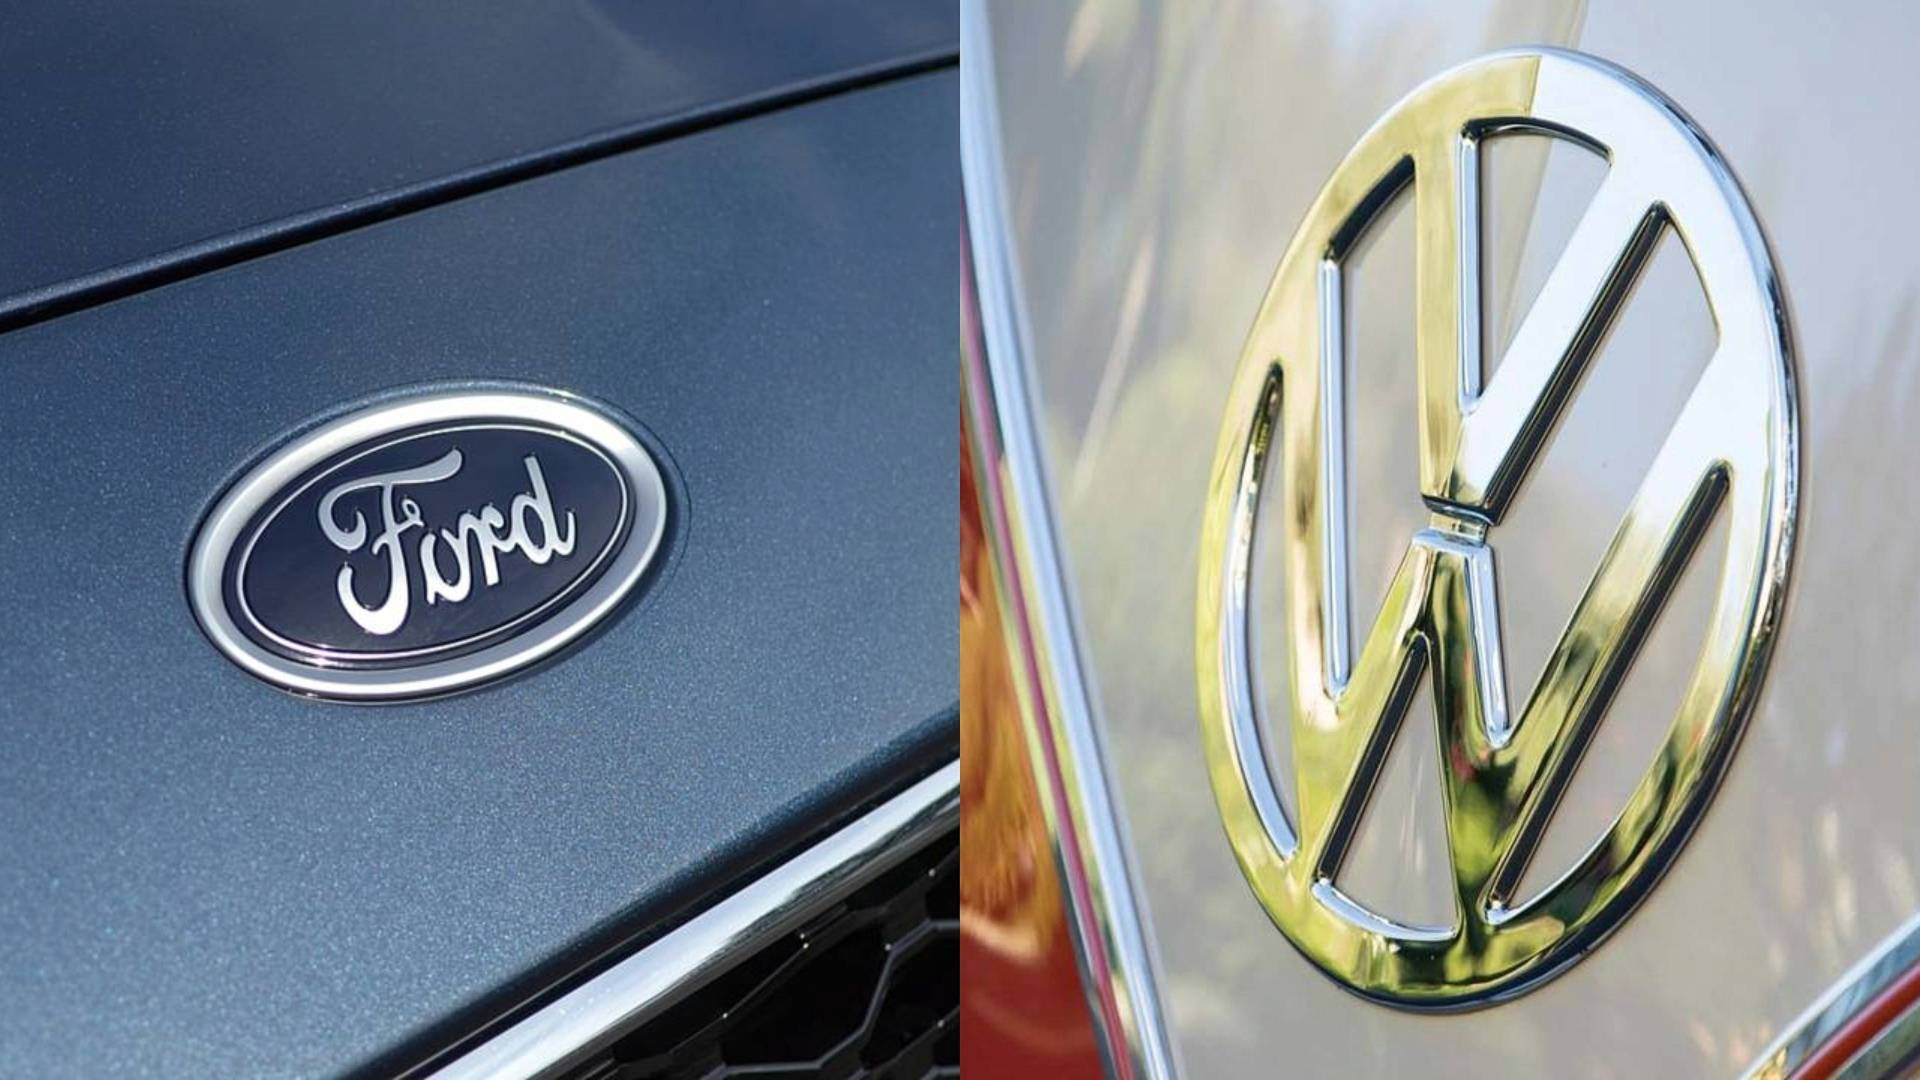 Ford опроверг слухи о слиянии с Volkswagen 1